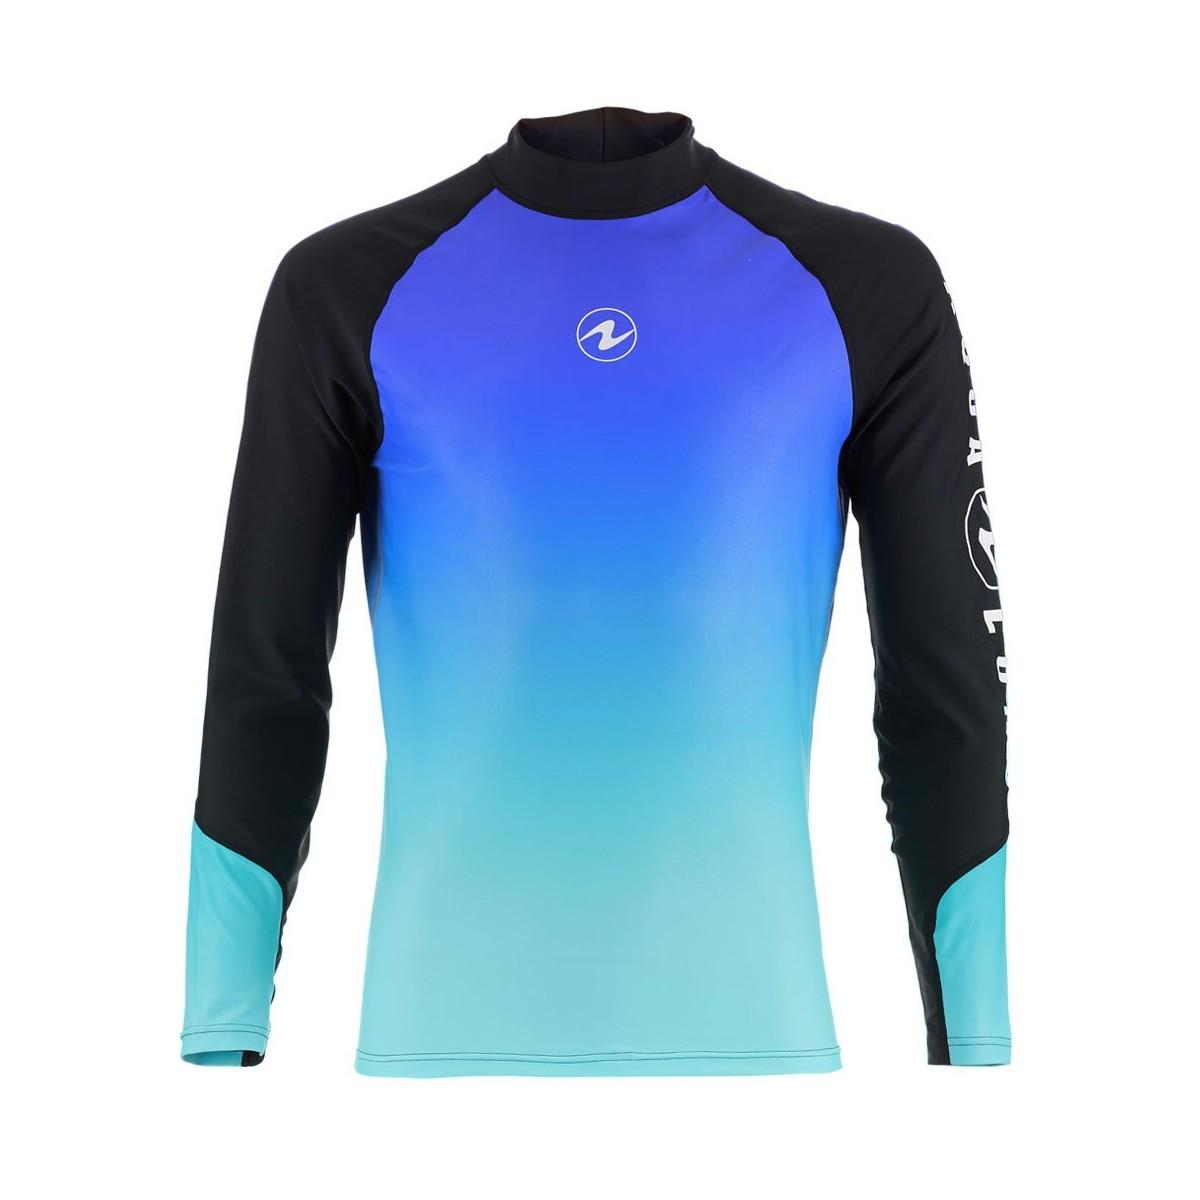 Aqua Lung Men's Long Sleeve Athletic Fit Rashguard